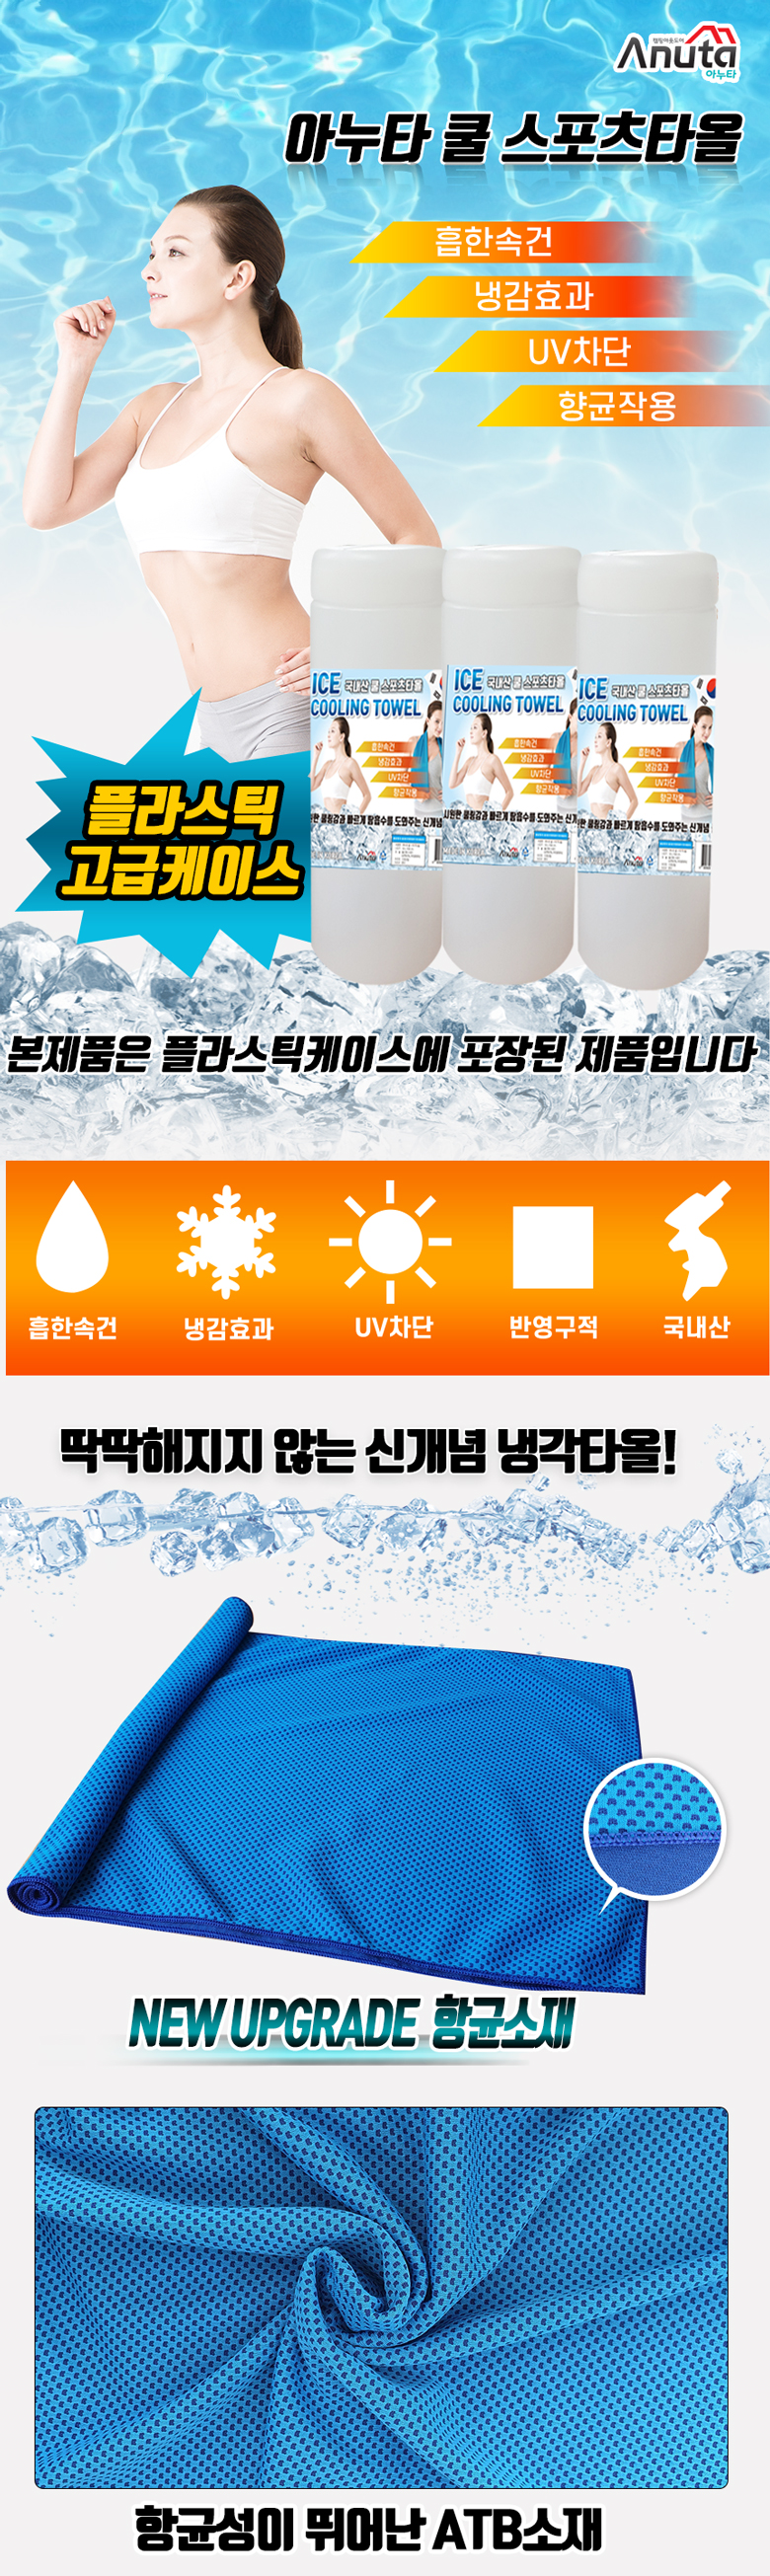 20_anuta_cool_towel_case_detail_01.jpg